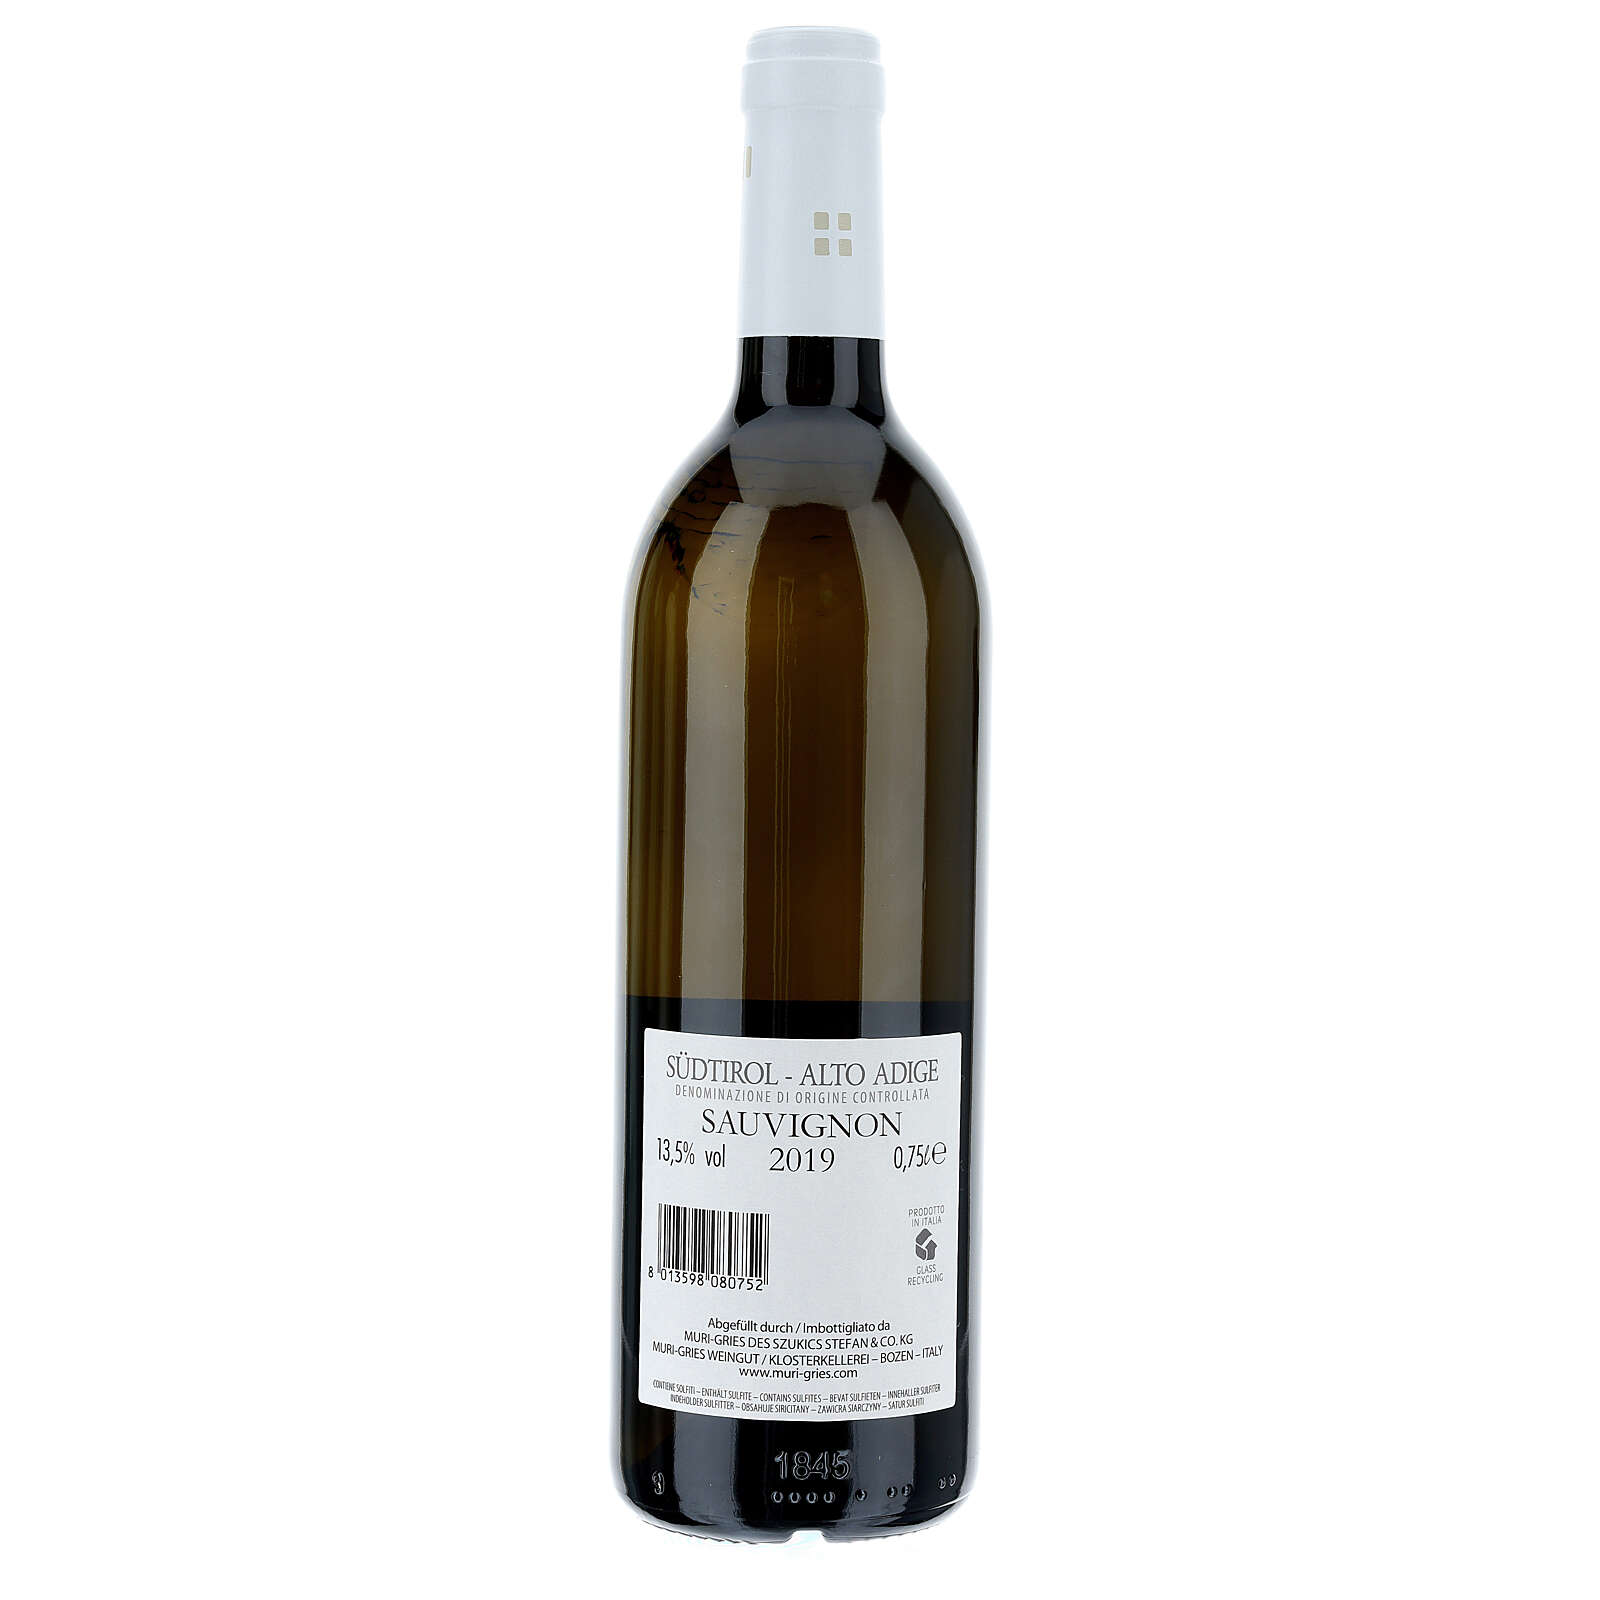 Vino Sauvignon DOC 2019 Abadía Muri Gries 750 ml 3